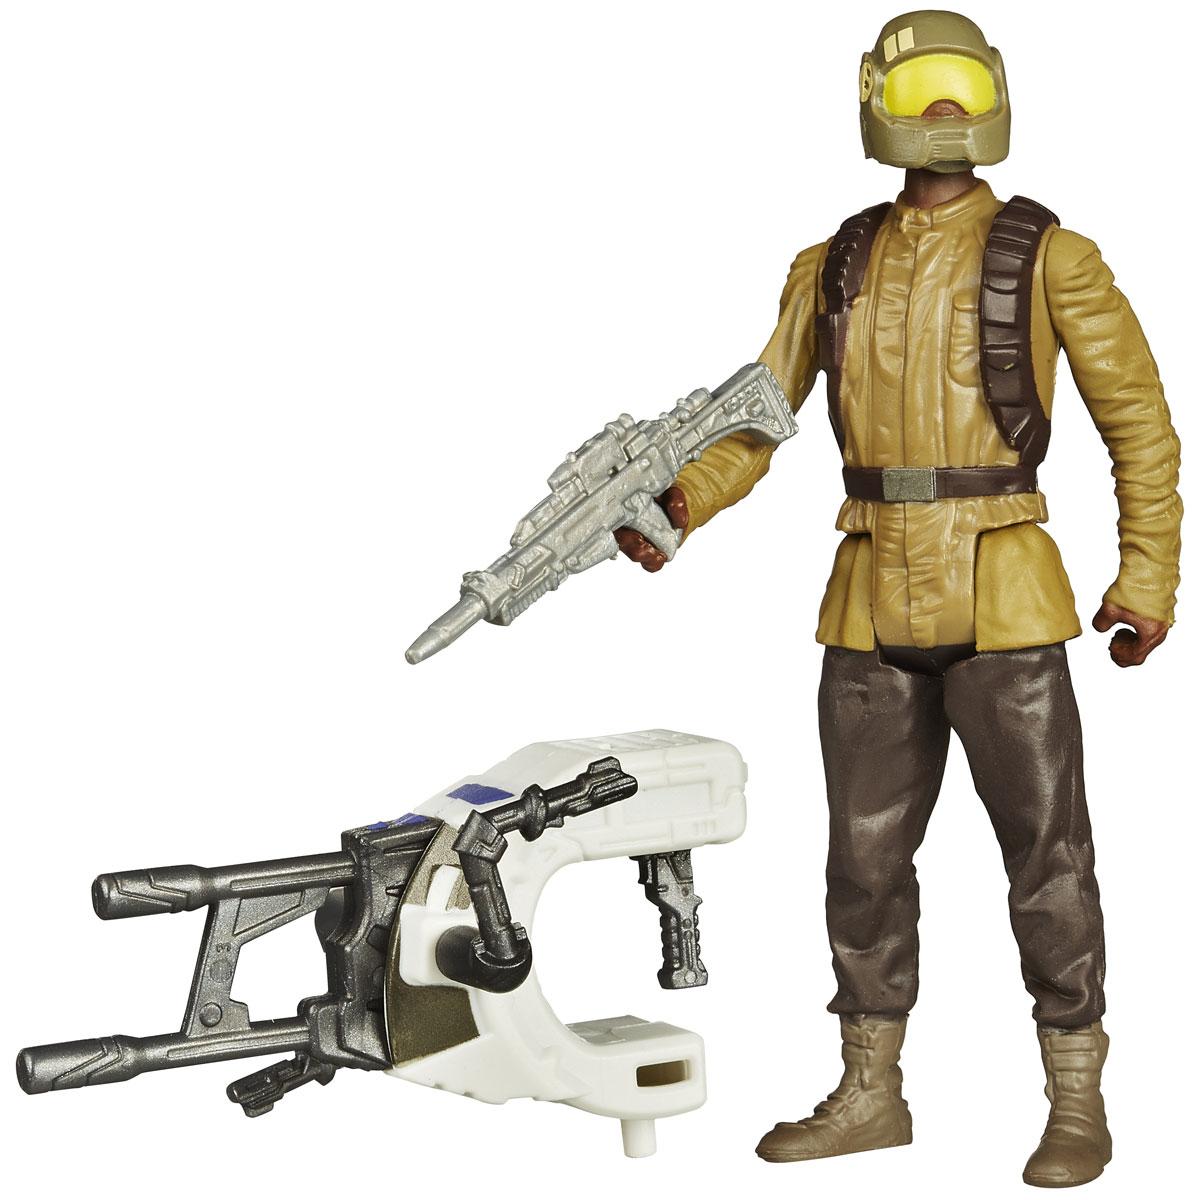 Star Wars Фигурка Resistance Trooper skylanders trap team интерактивная фигурка мастер ловушек lob star